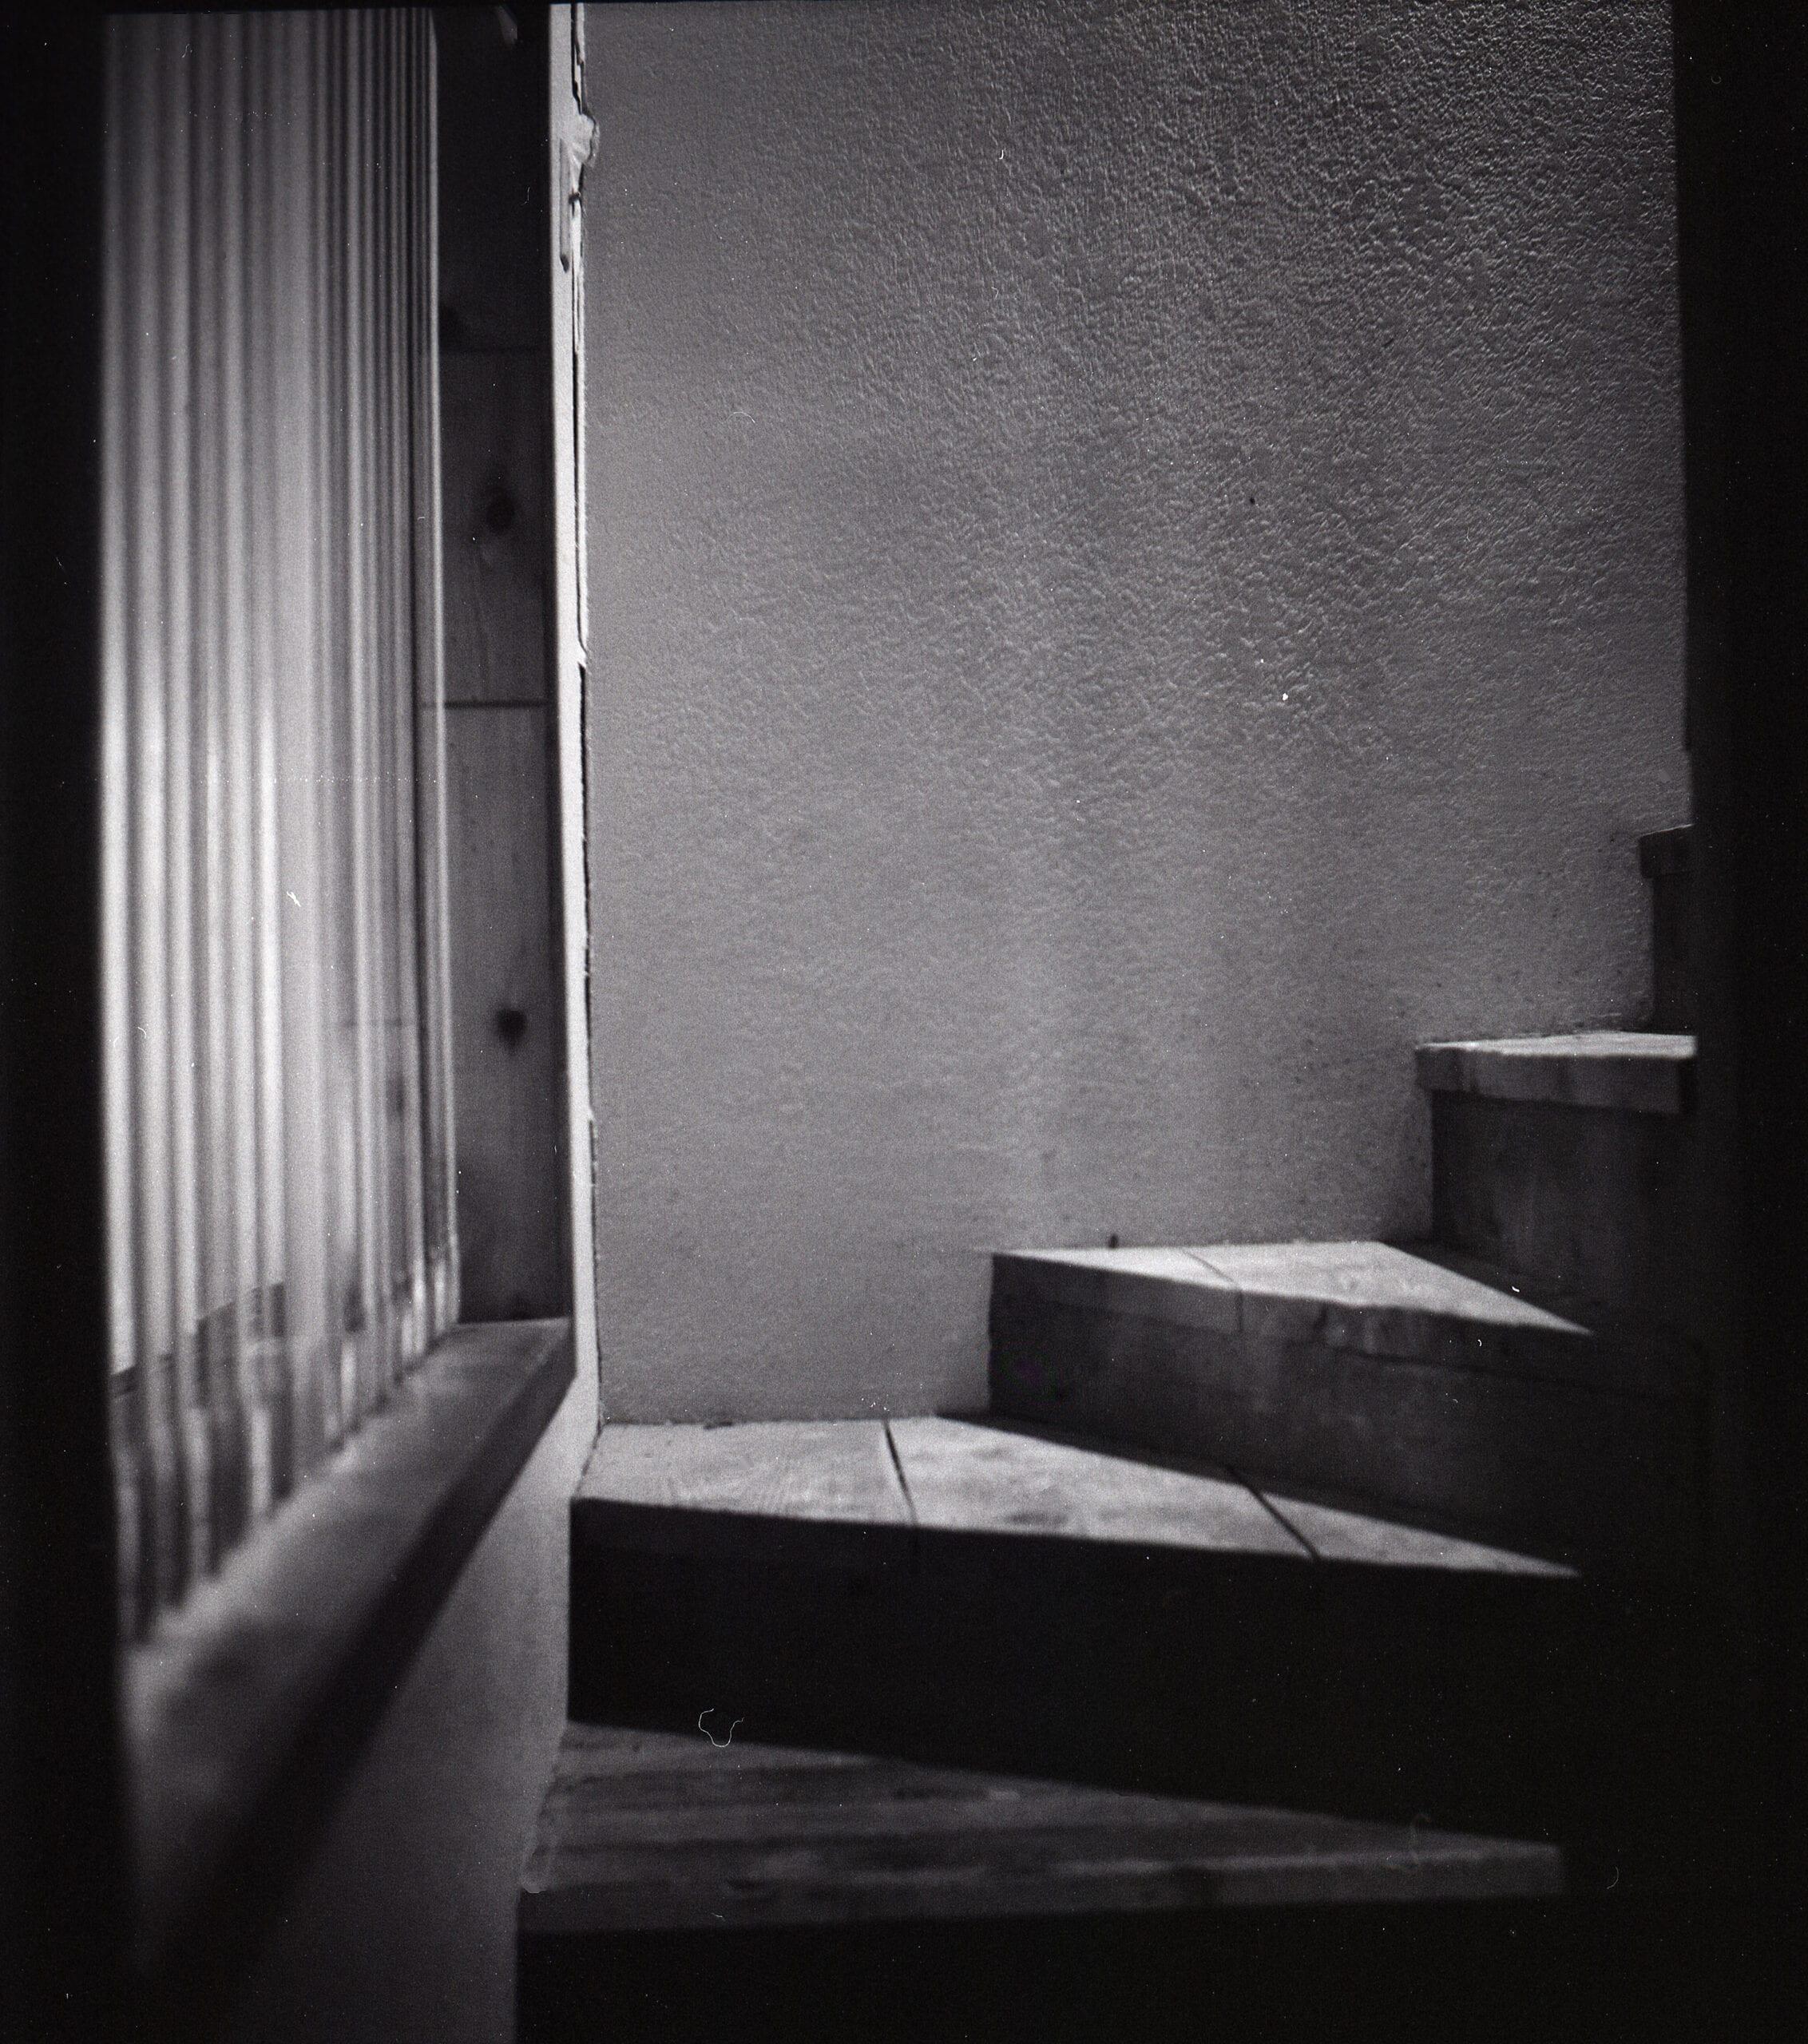 carolinayanez_staircase_2020_deep_matte_fine_art_print_10x10in